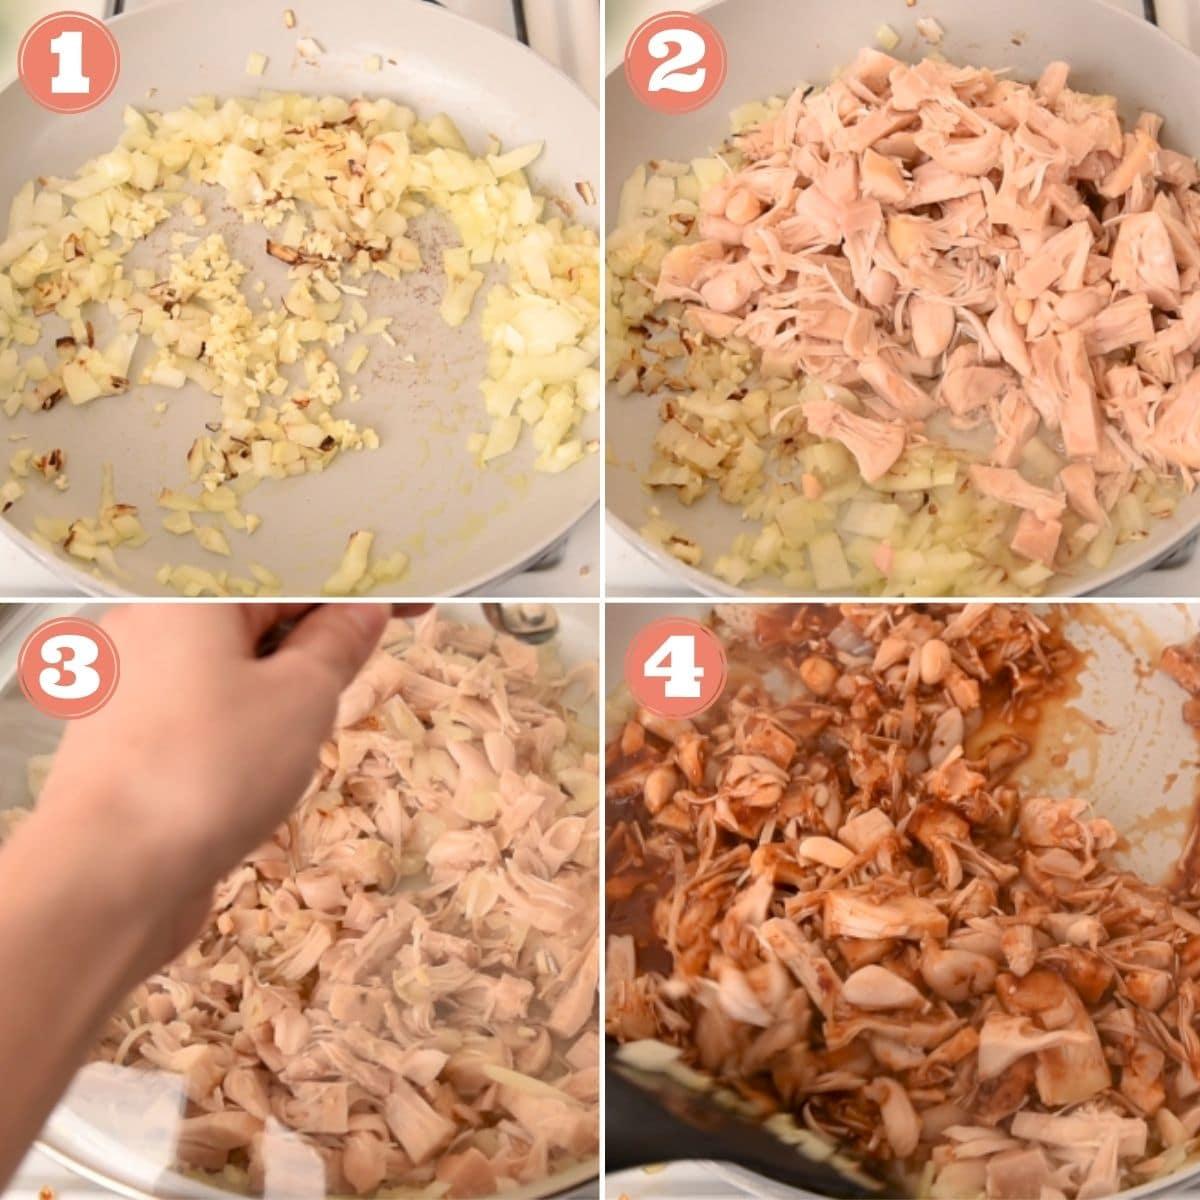 Steps 1 through 4 to make bbq jackfruit